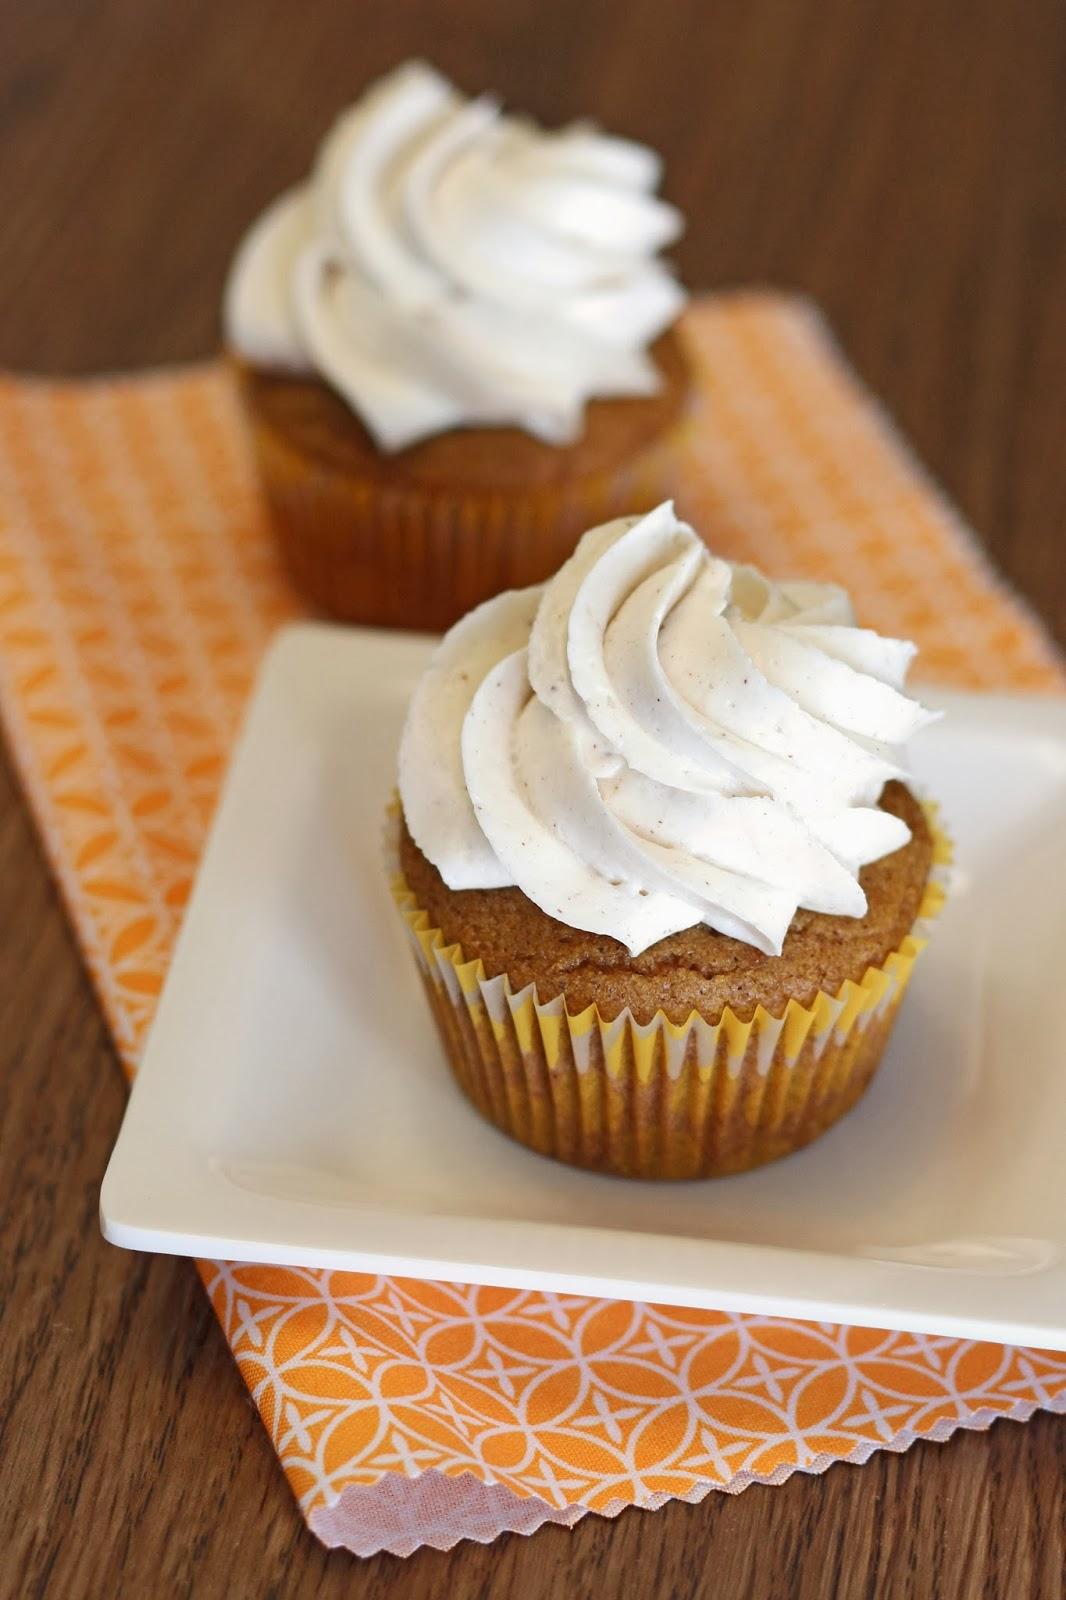 Sarah Bakes Gluten Free Treats: gluten free vegan pumpkin ...